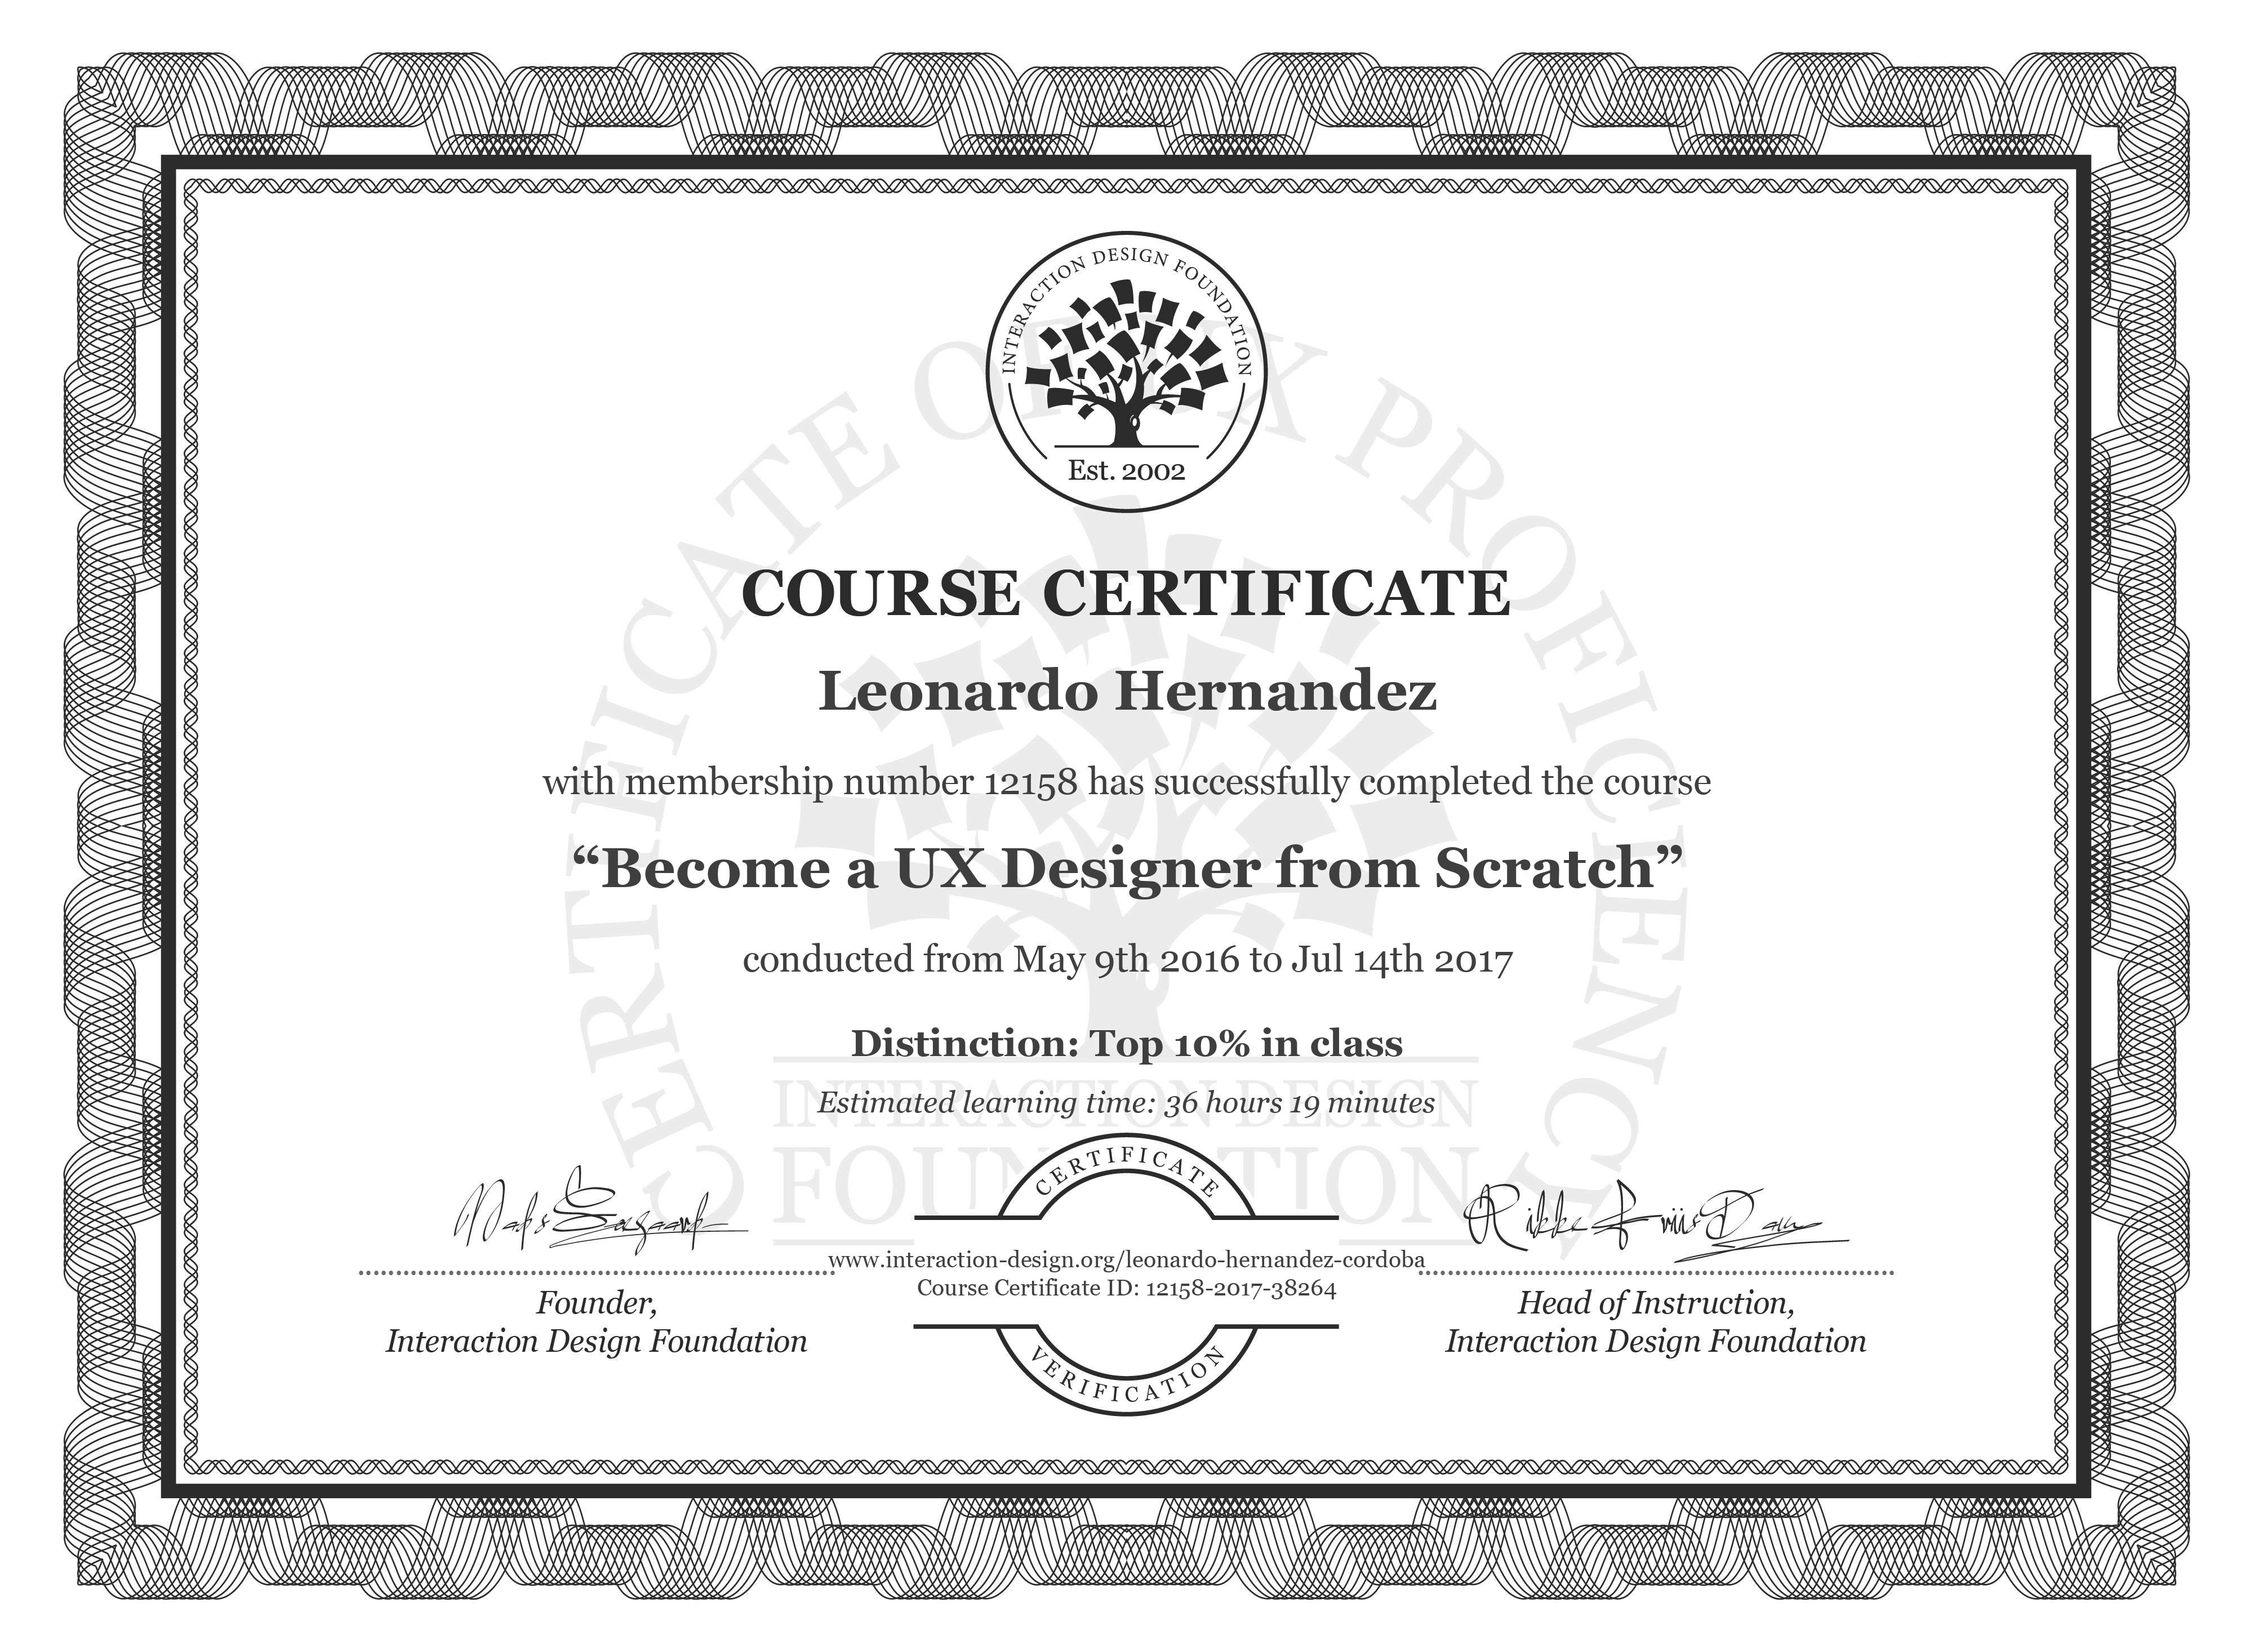 Leonardo: Course Certificate - Become a UX Designer from Scratch